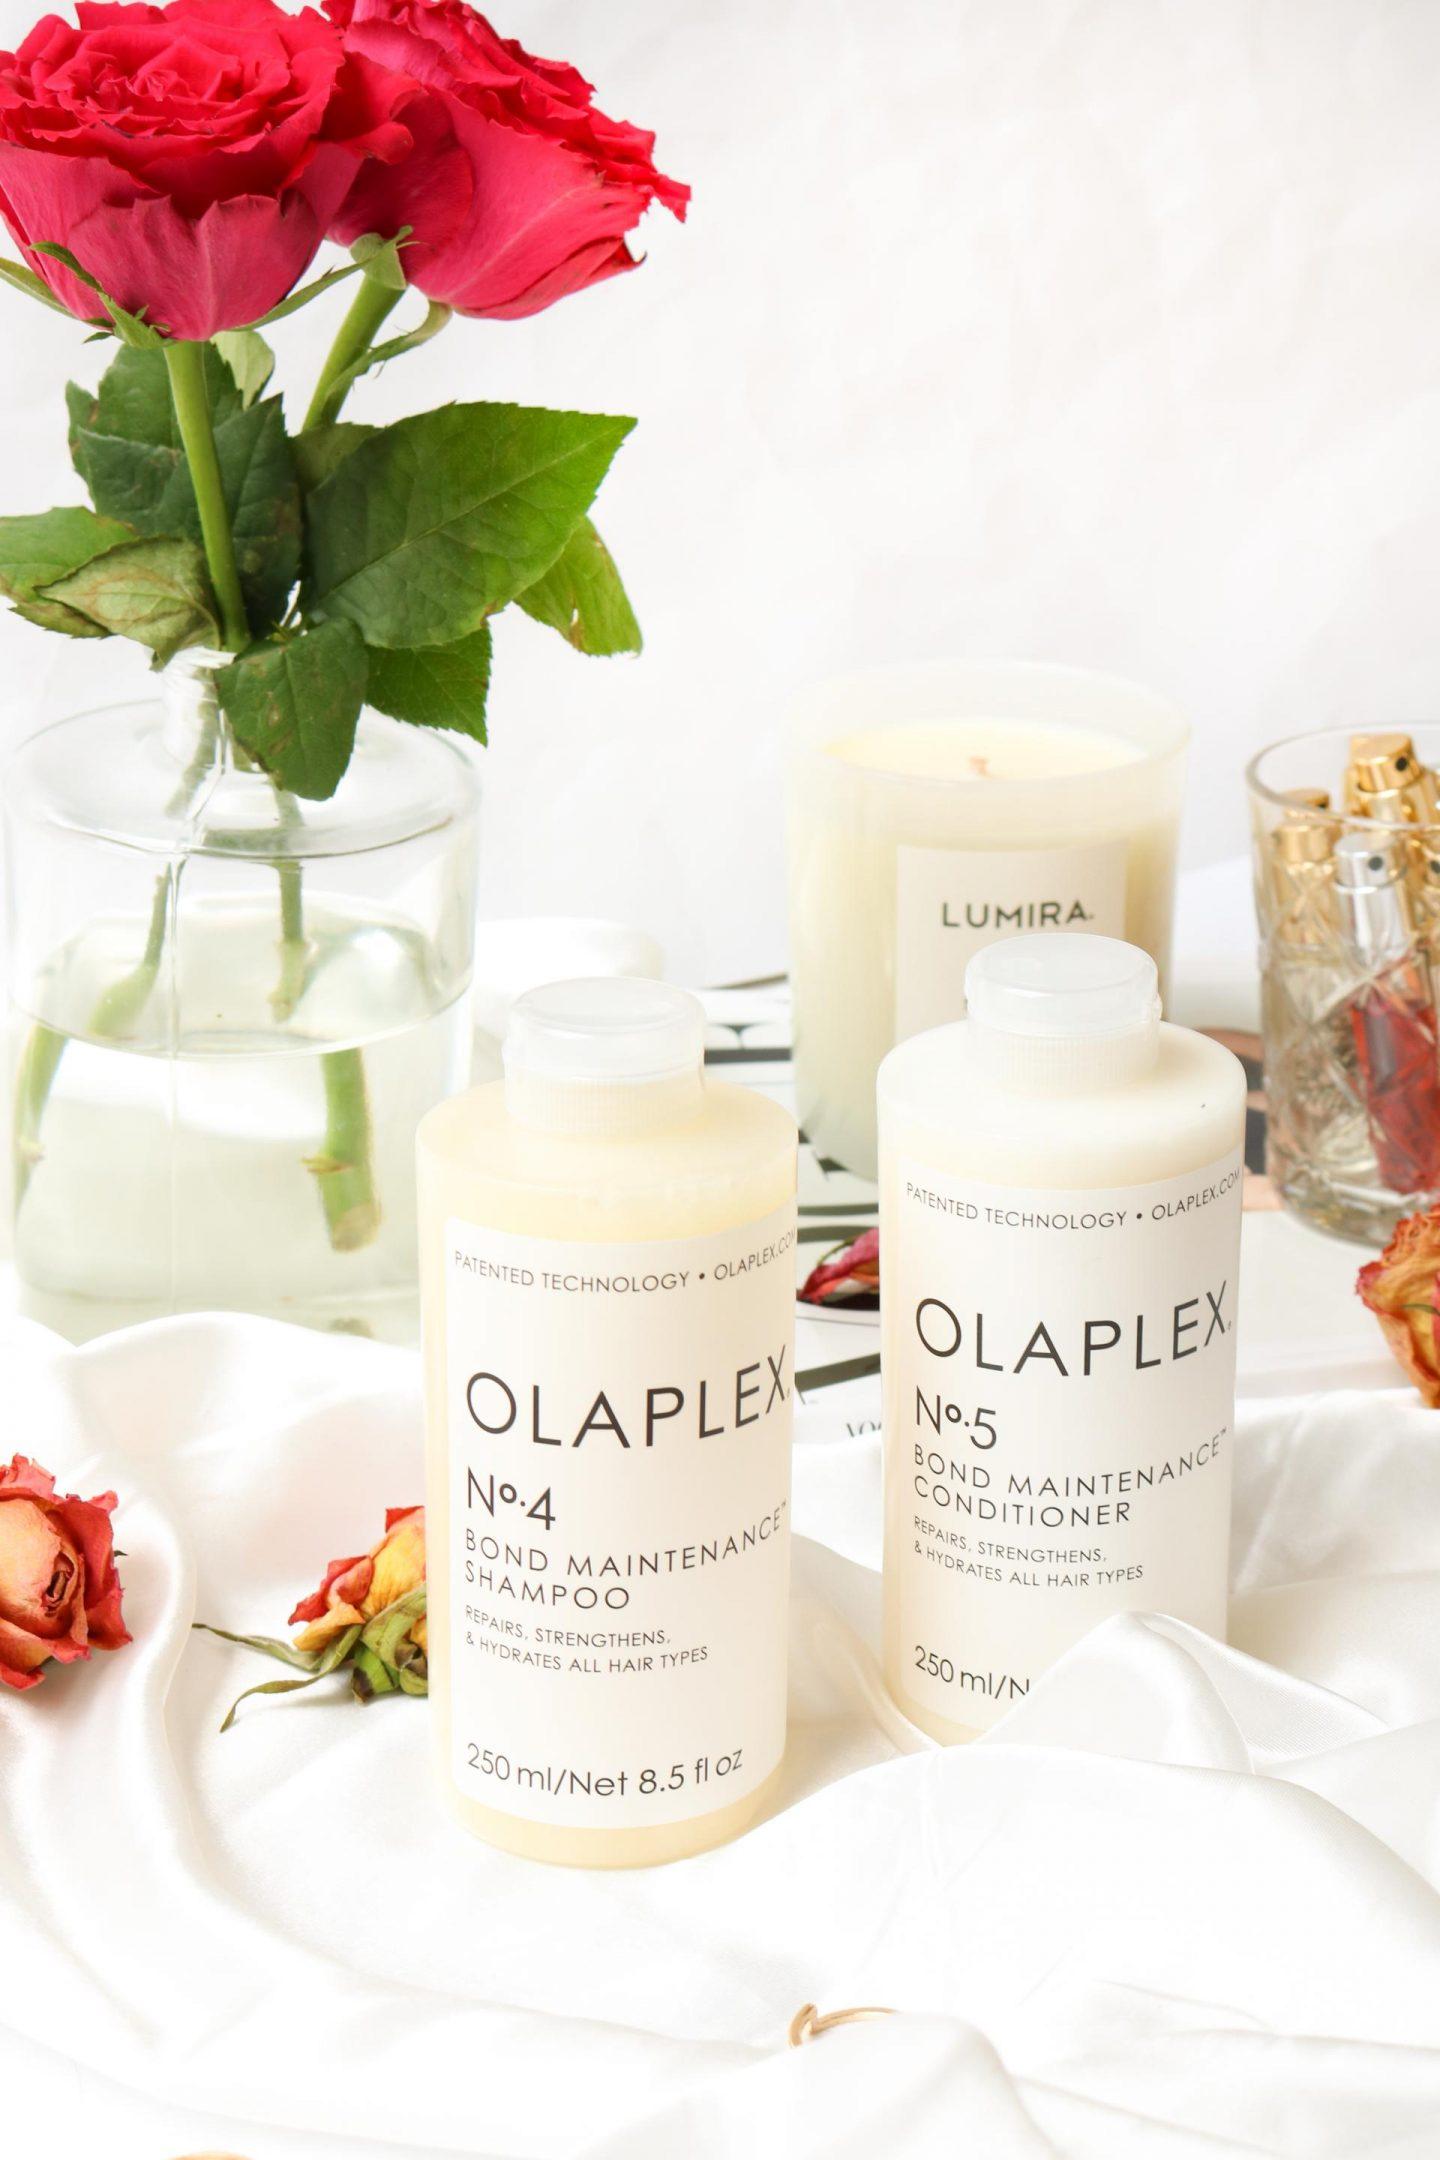 Olaplex Shampoo and Conditioner